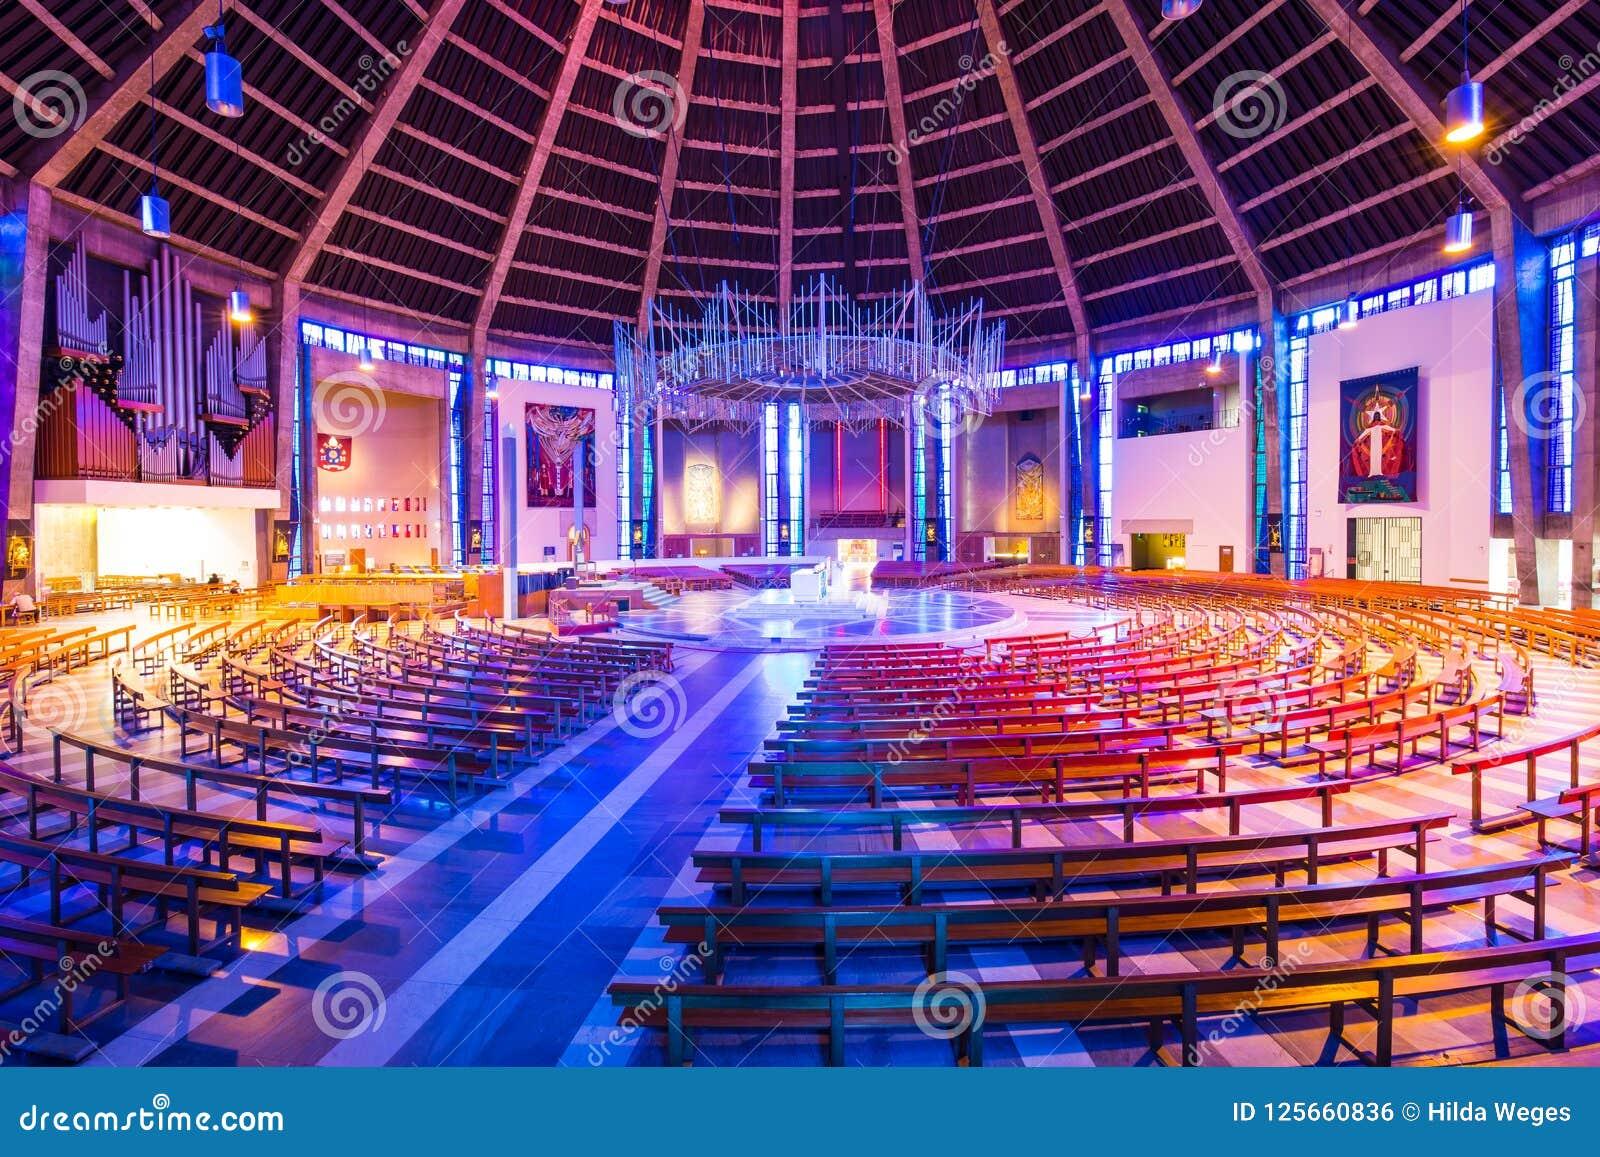 Catedral metropolitana en Liverpool, Reino Unido